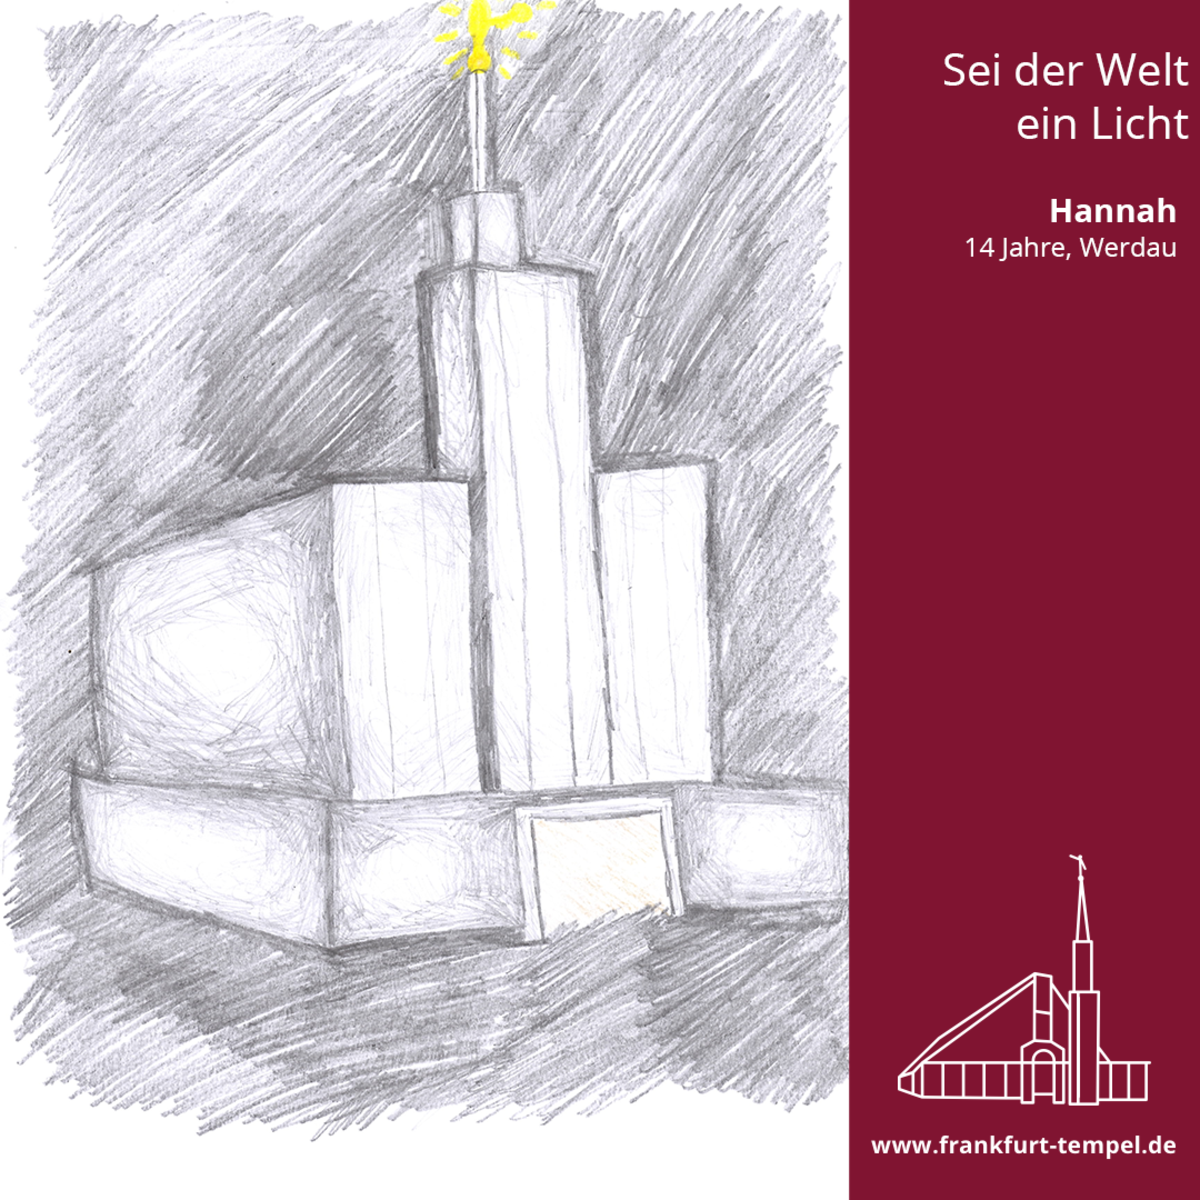 Kinderbild von einem Tempel/acp/bc/cp/Europe/Germany/2019/tempel/2/FTOH_Hannah14.png